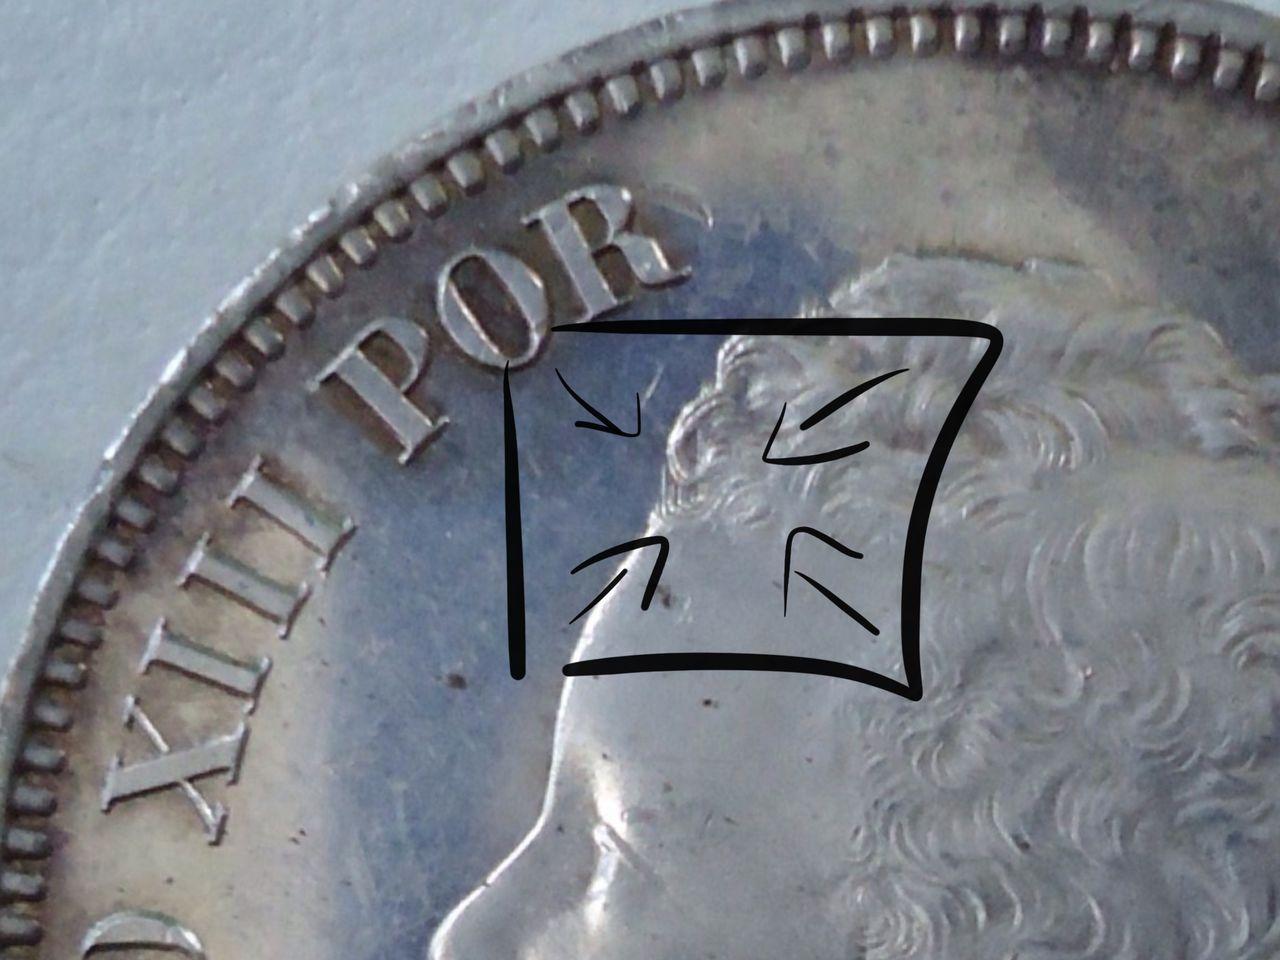 5 PESETAS 1893 ALFONSO XIII (BUCLES)  - Página 2 Image